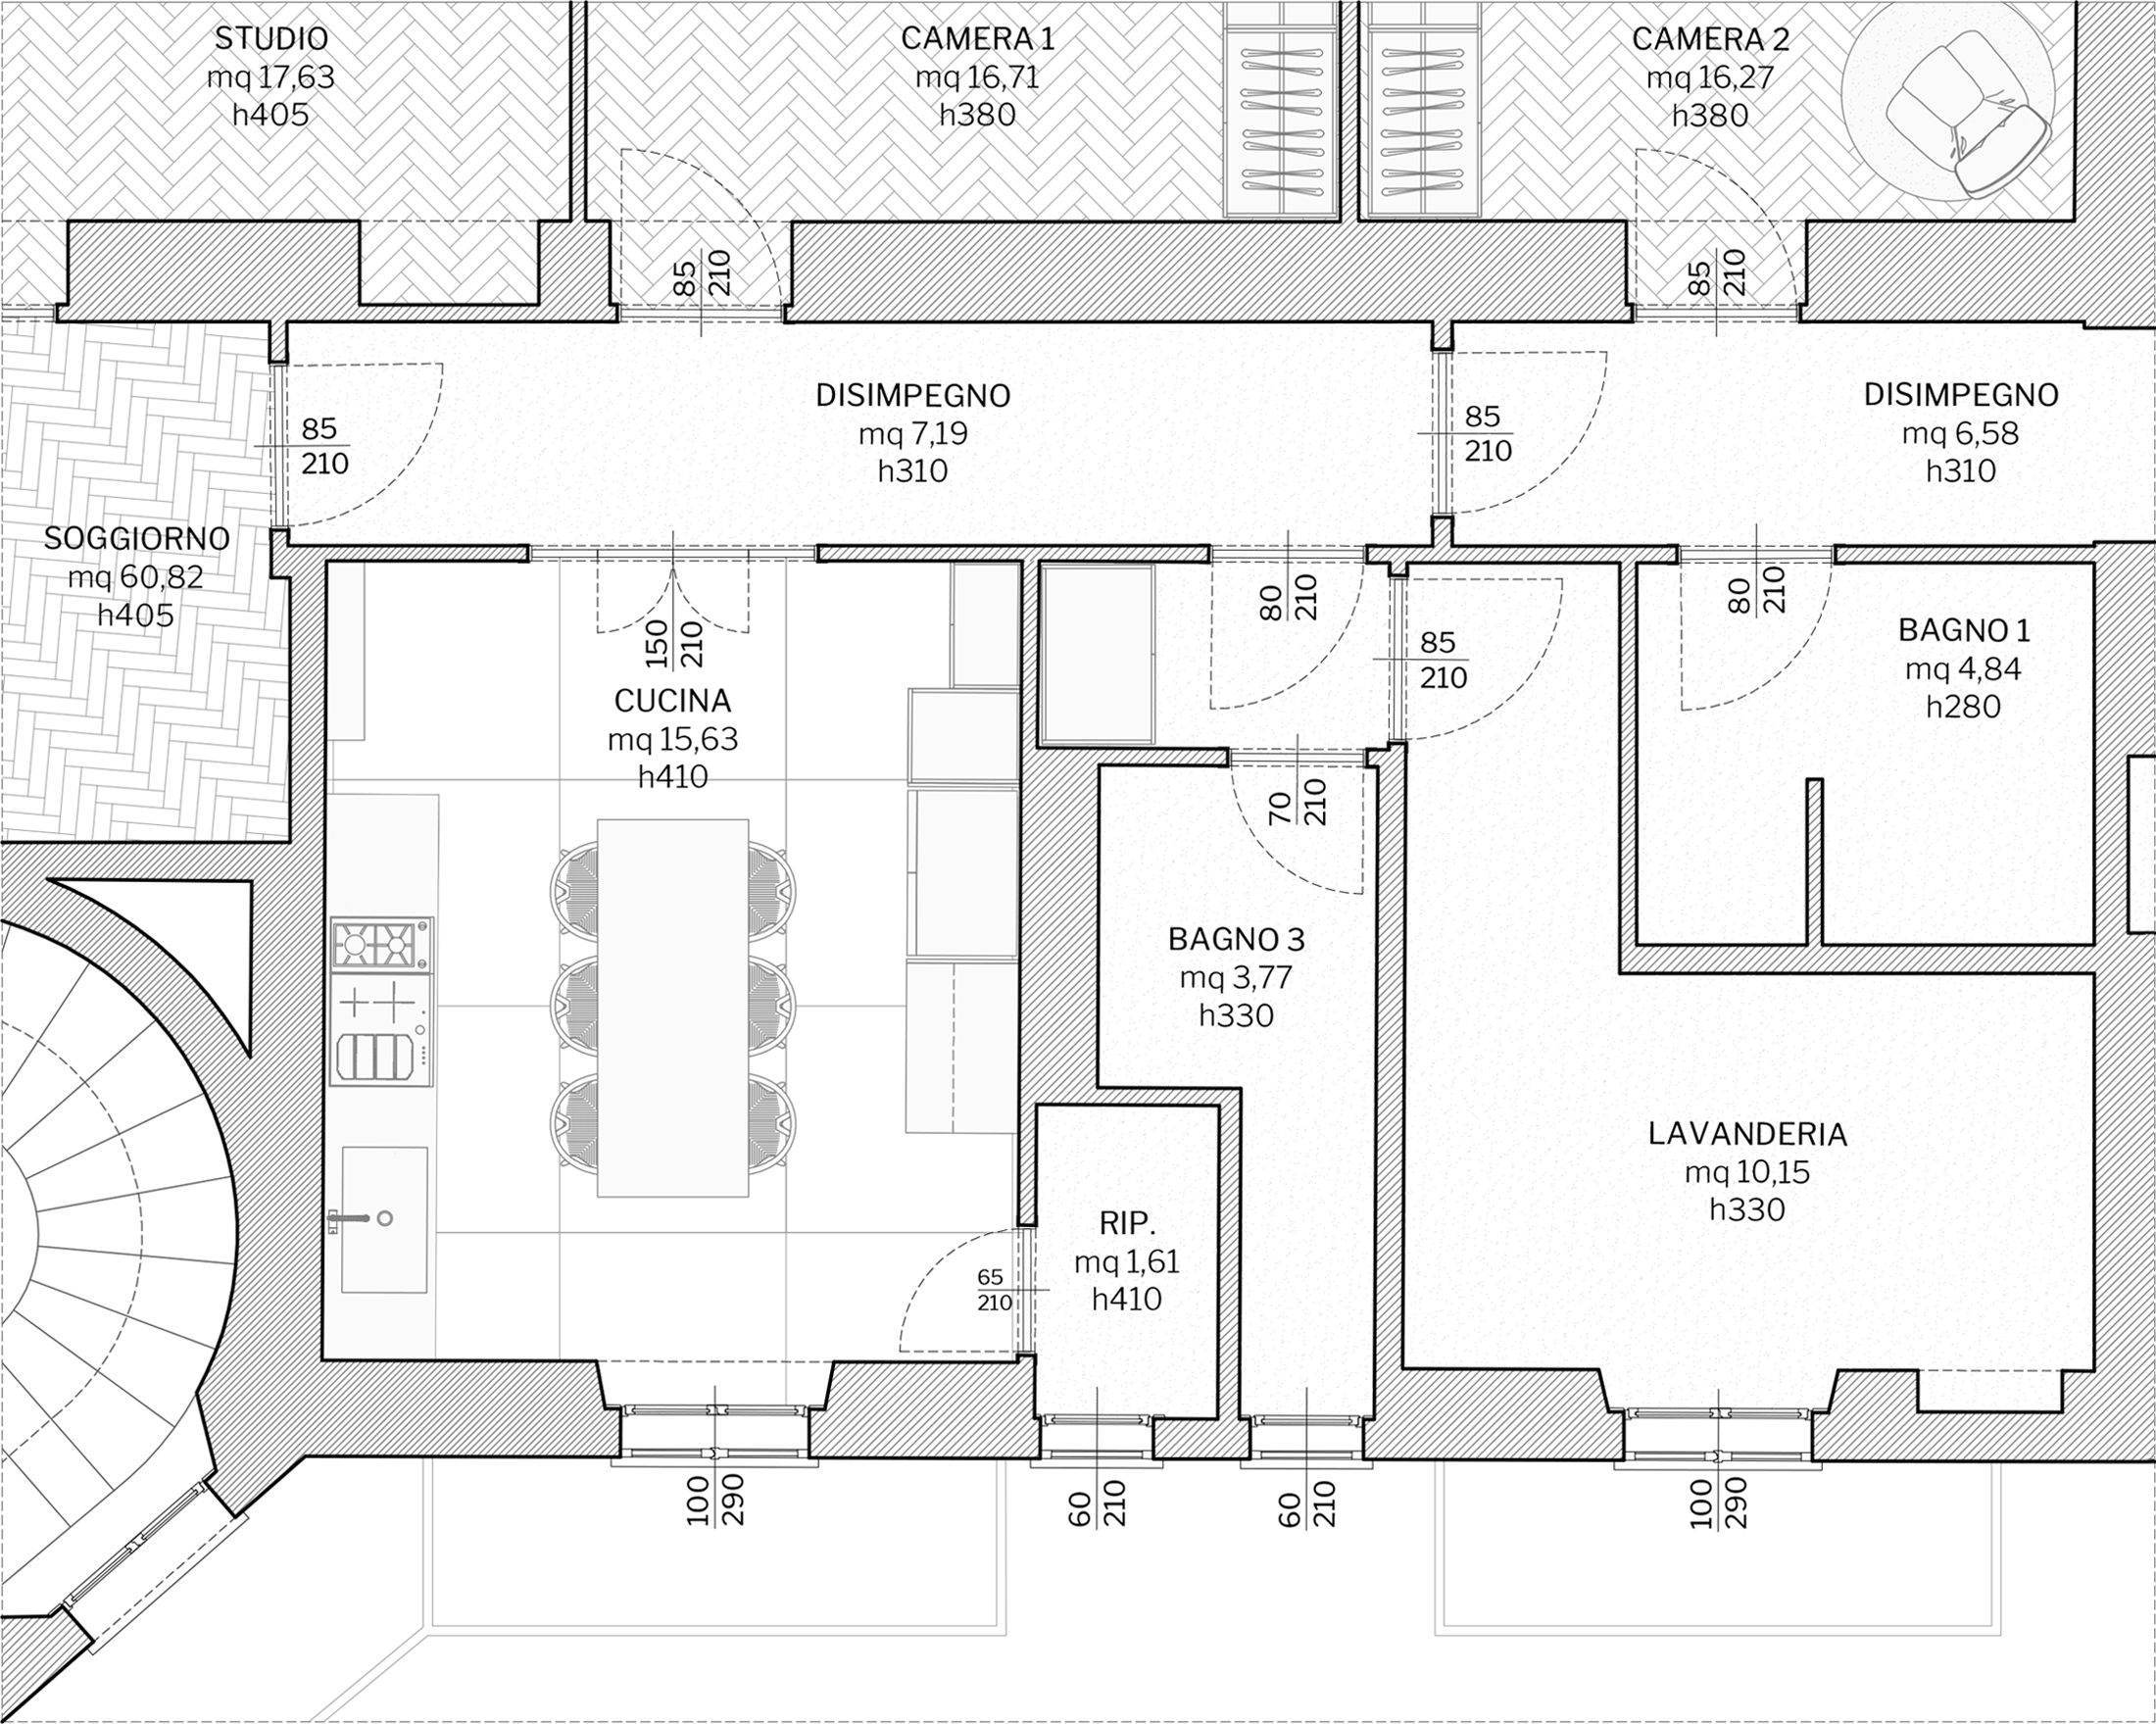 Appartamento in Milano, Magenta - Real Estate - cucina - planimetria